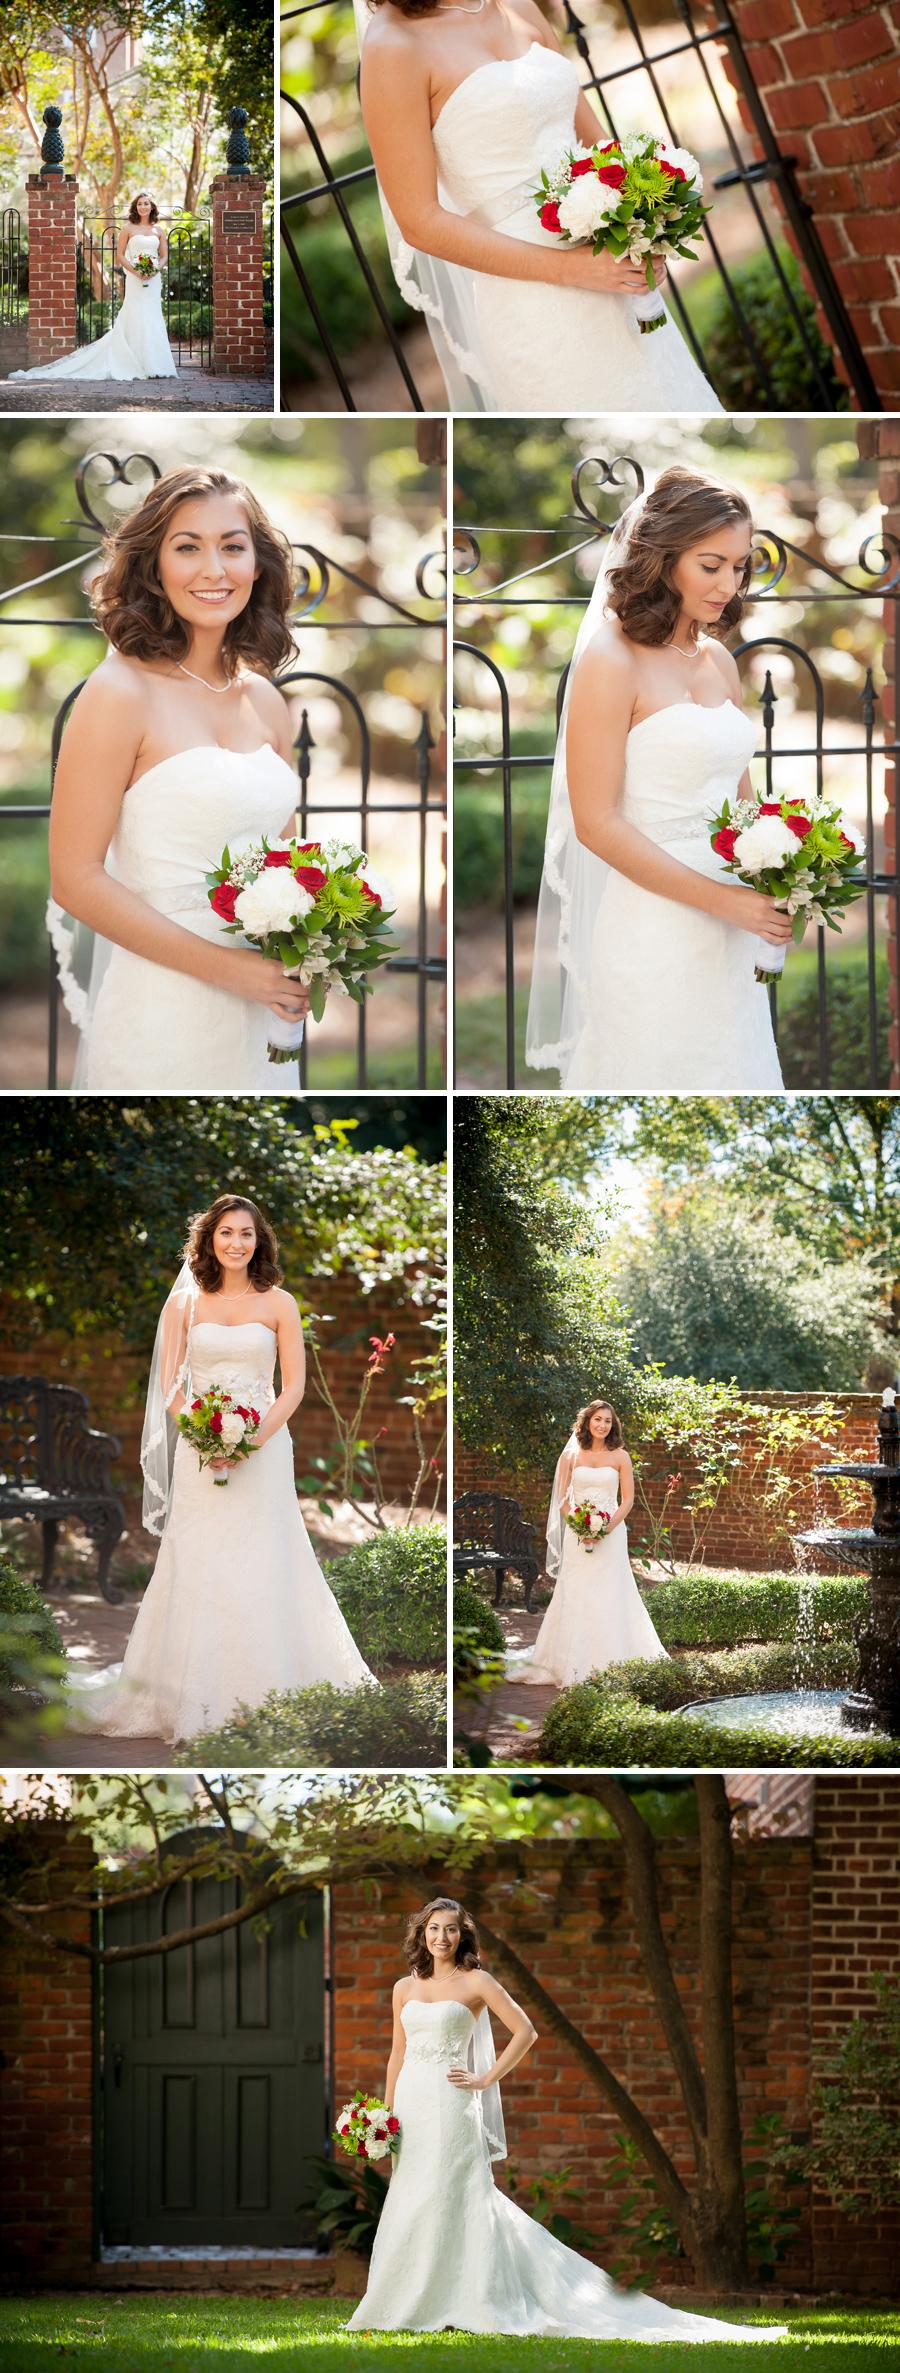 Amanda rocks her dress columbia sc wedding for Wedding dresses in columbia sc